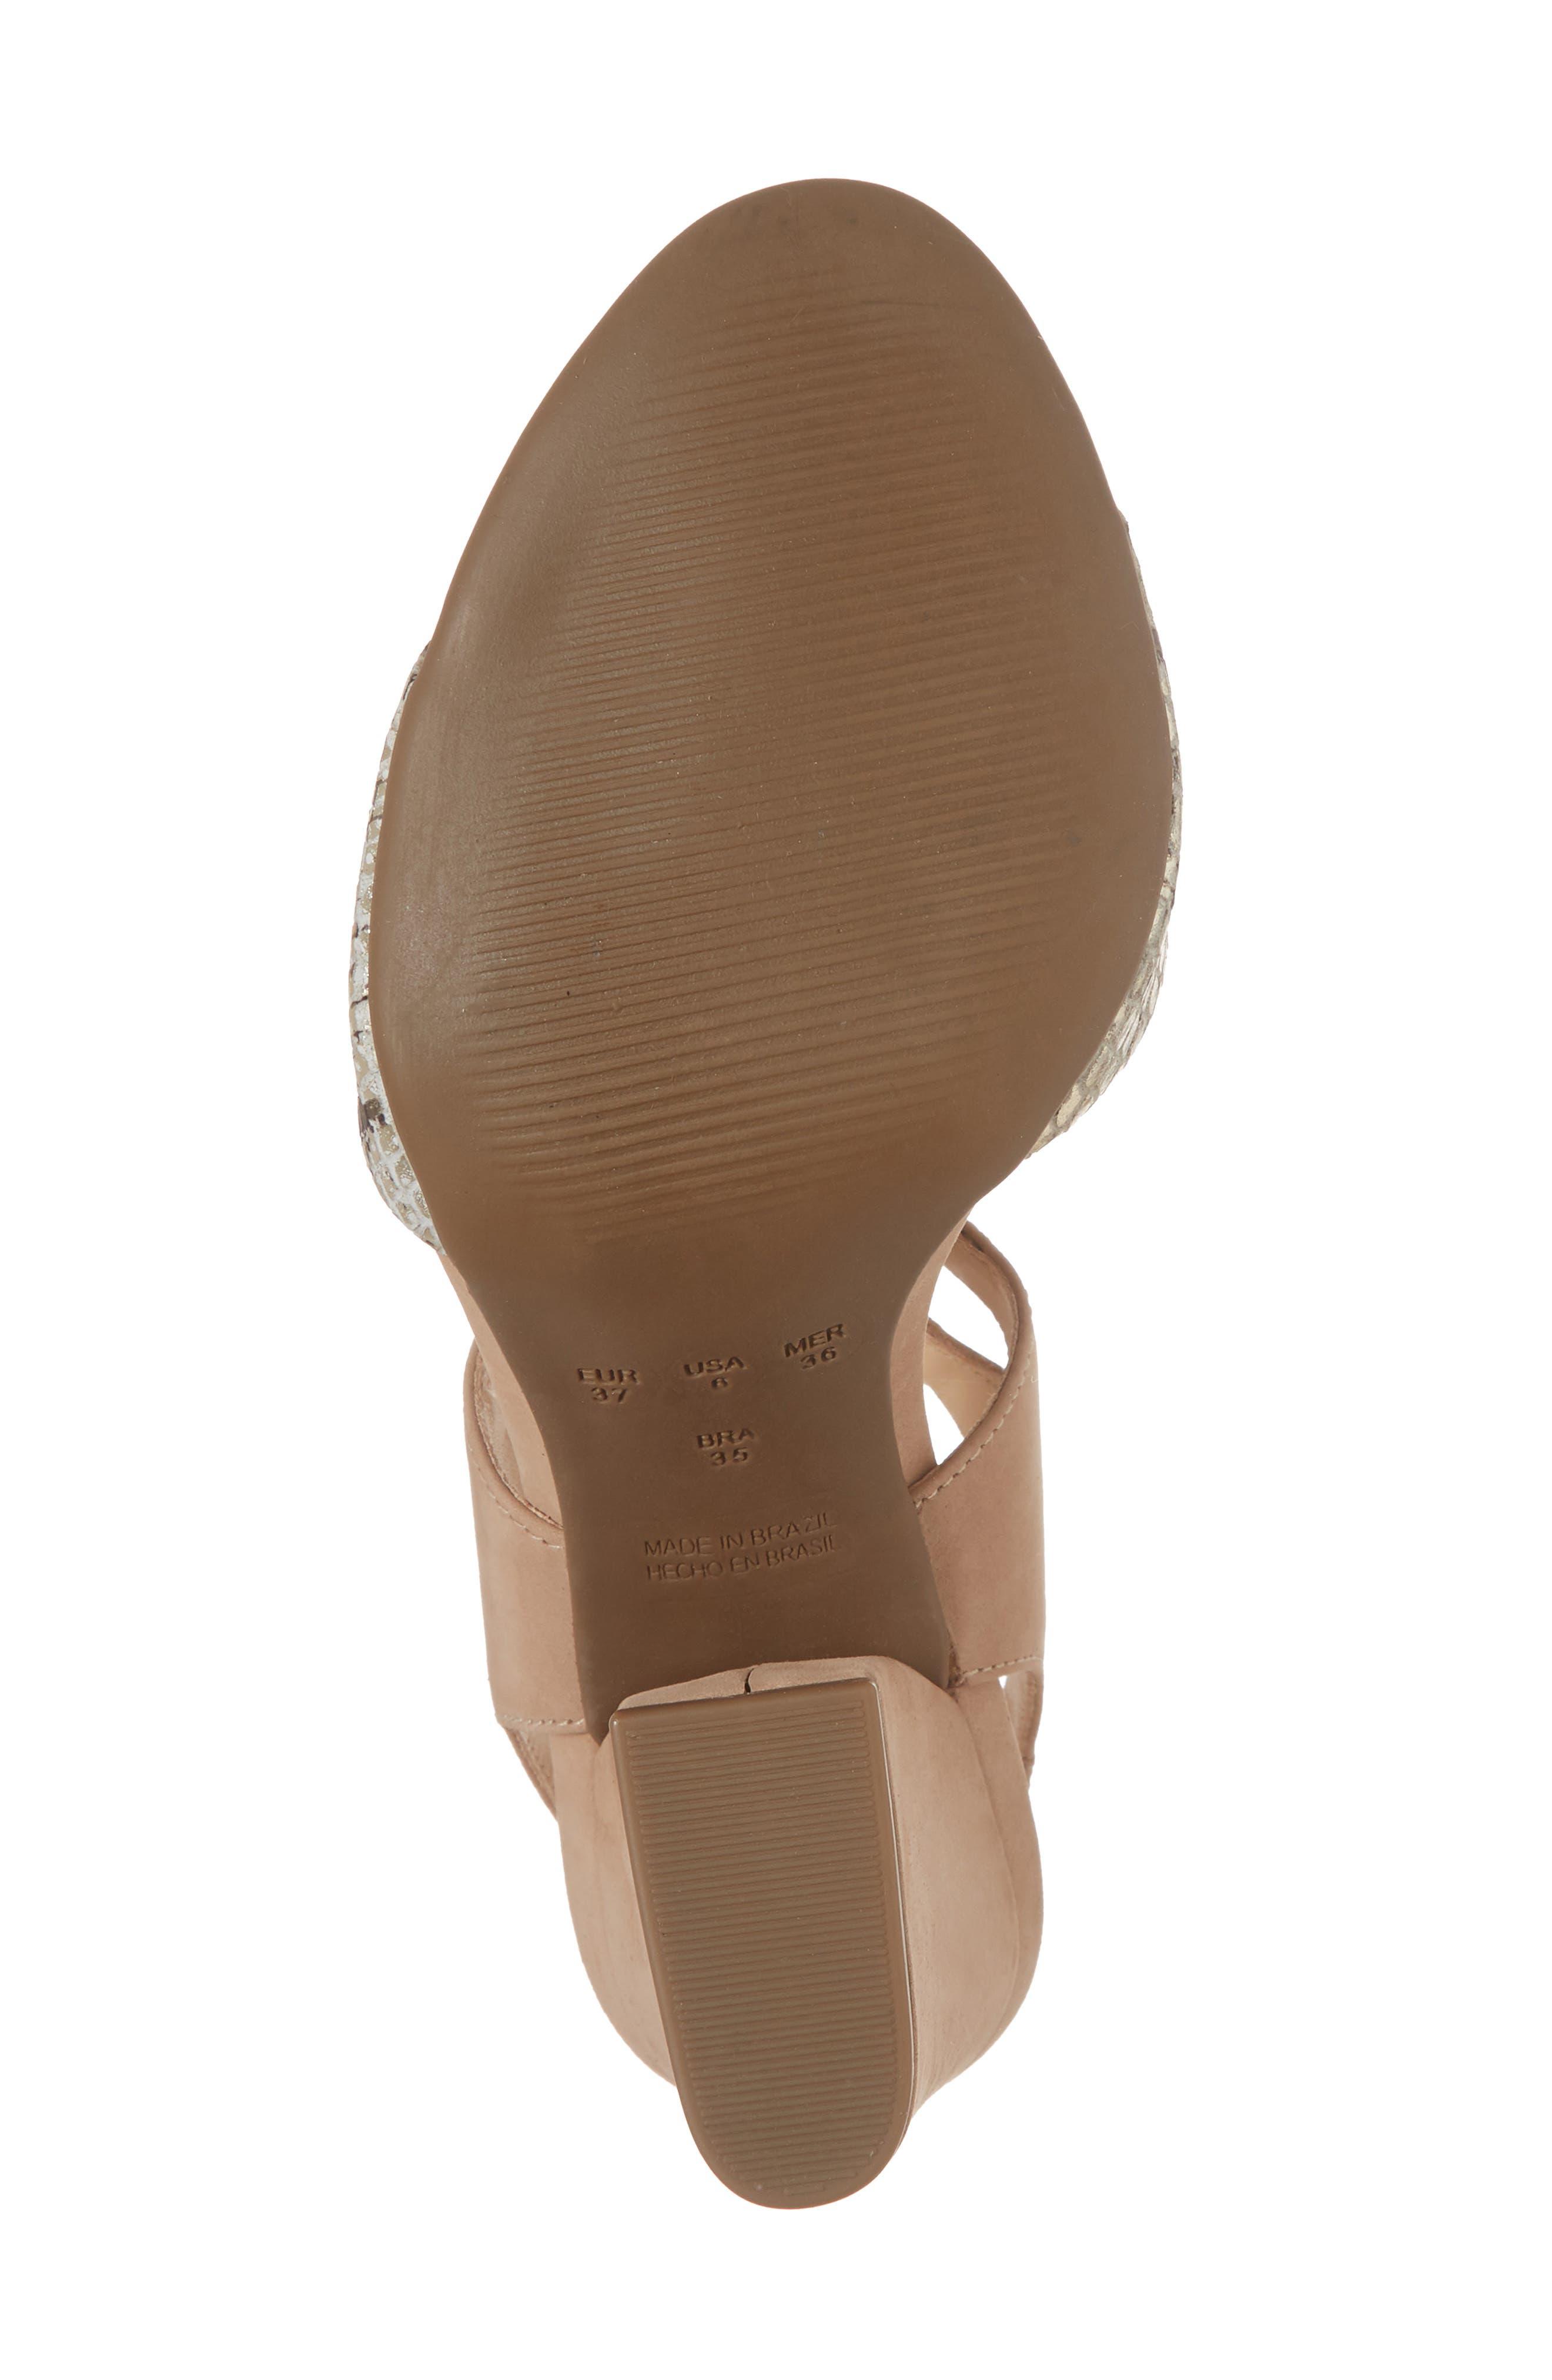 Kaira Ankle Wrap Sandal,                             Alternate thumbnail 6, color,                             Snake Print Leather